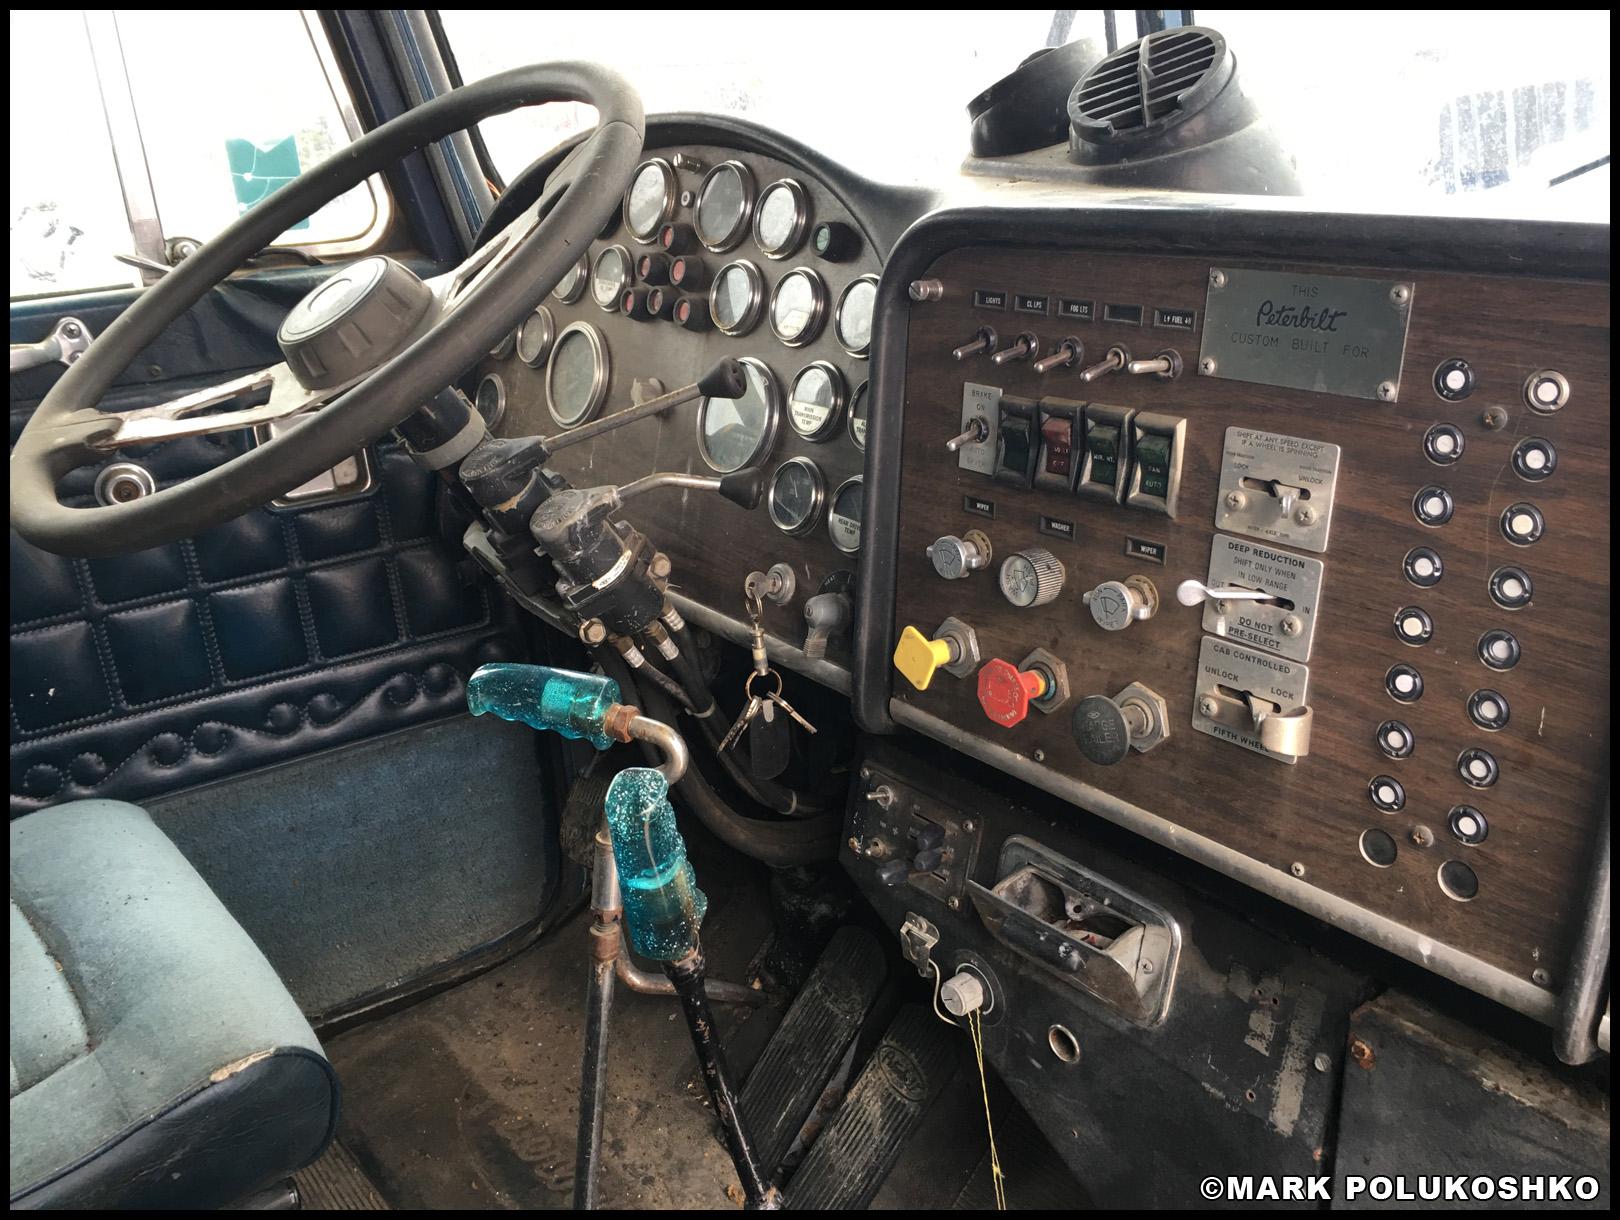 DuncanPutman com Truck of the Month - Mark Polukoshko's 1979